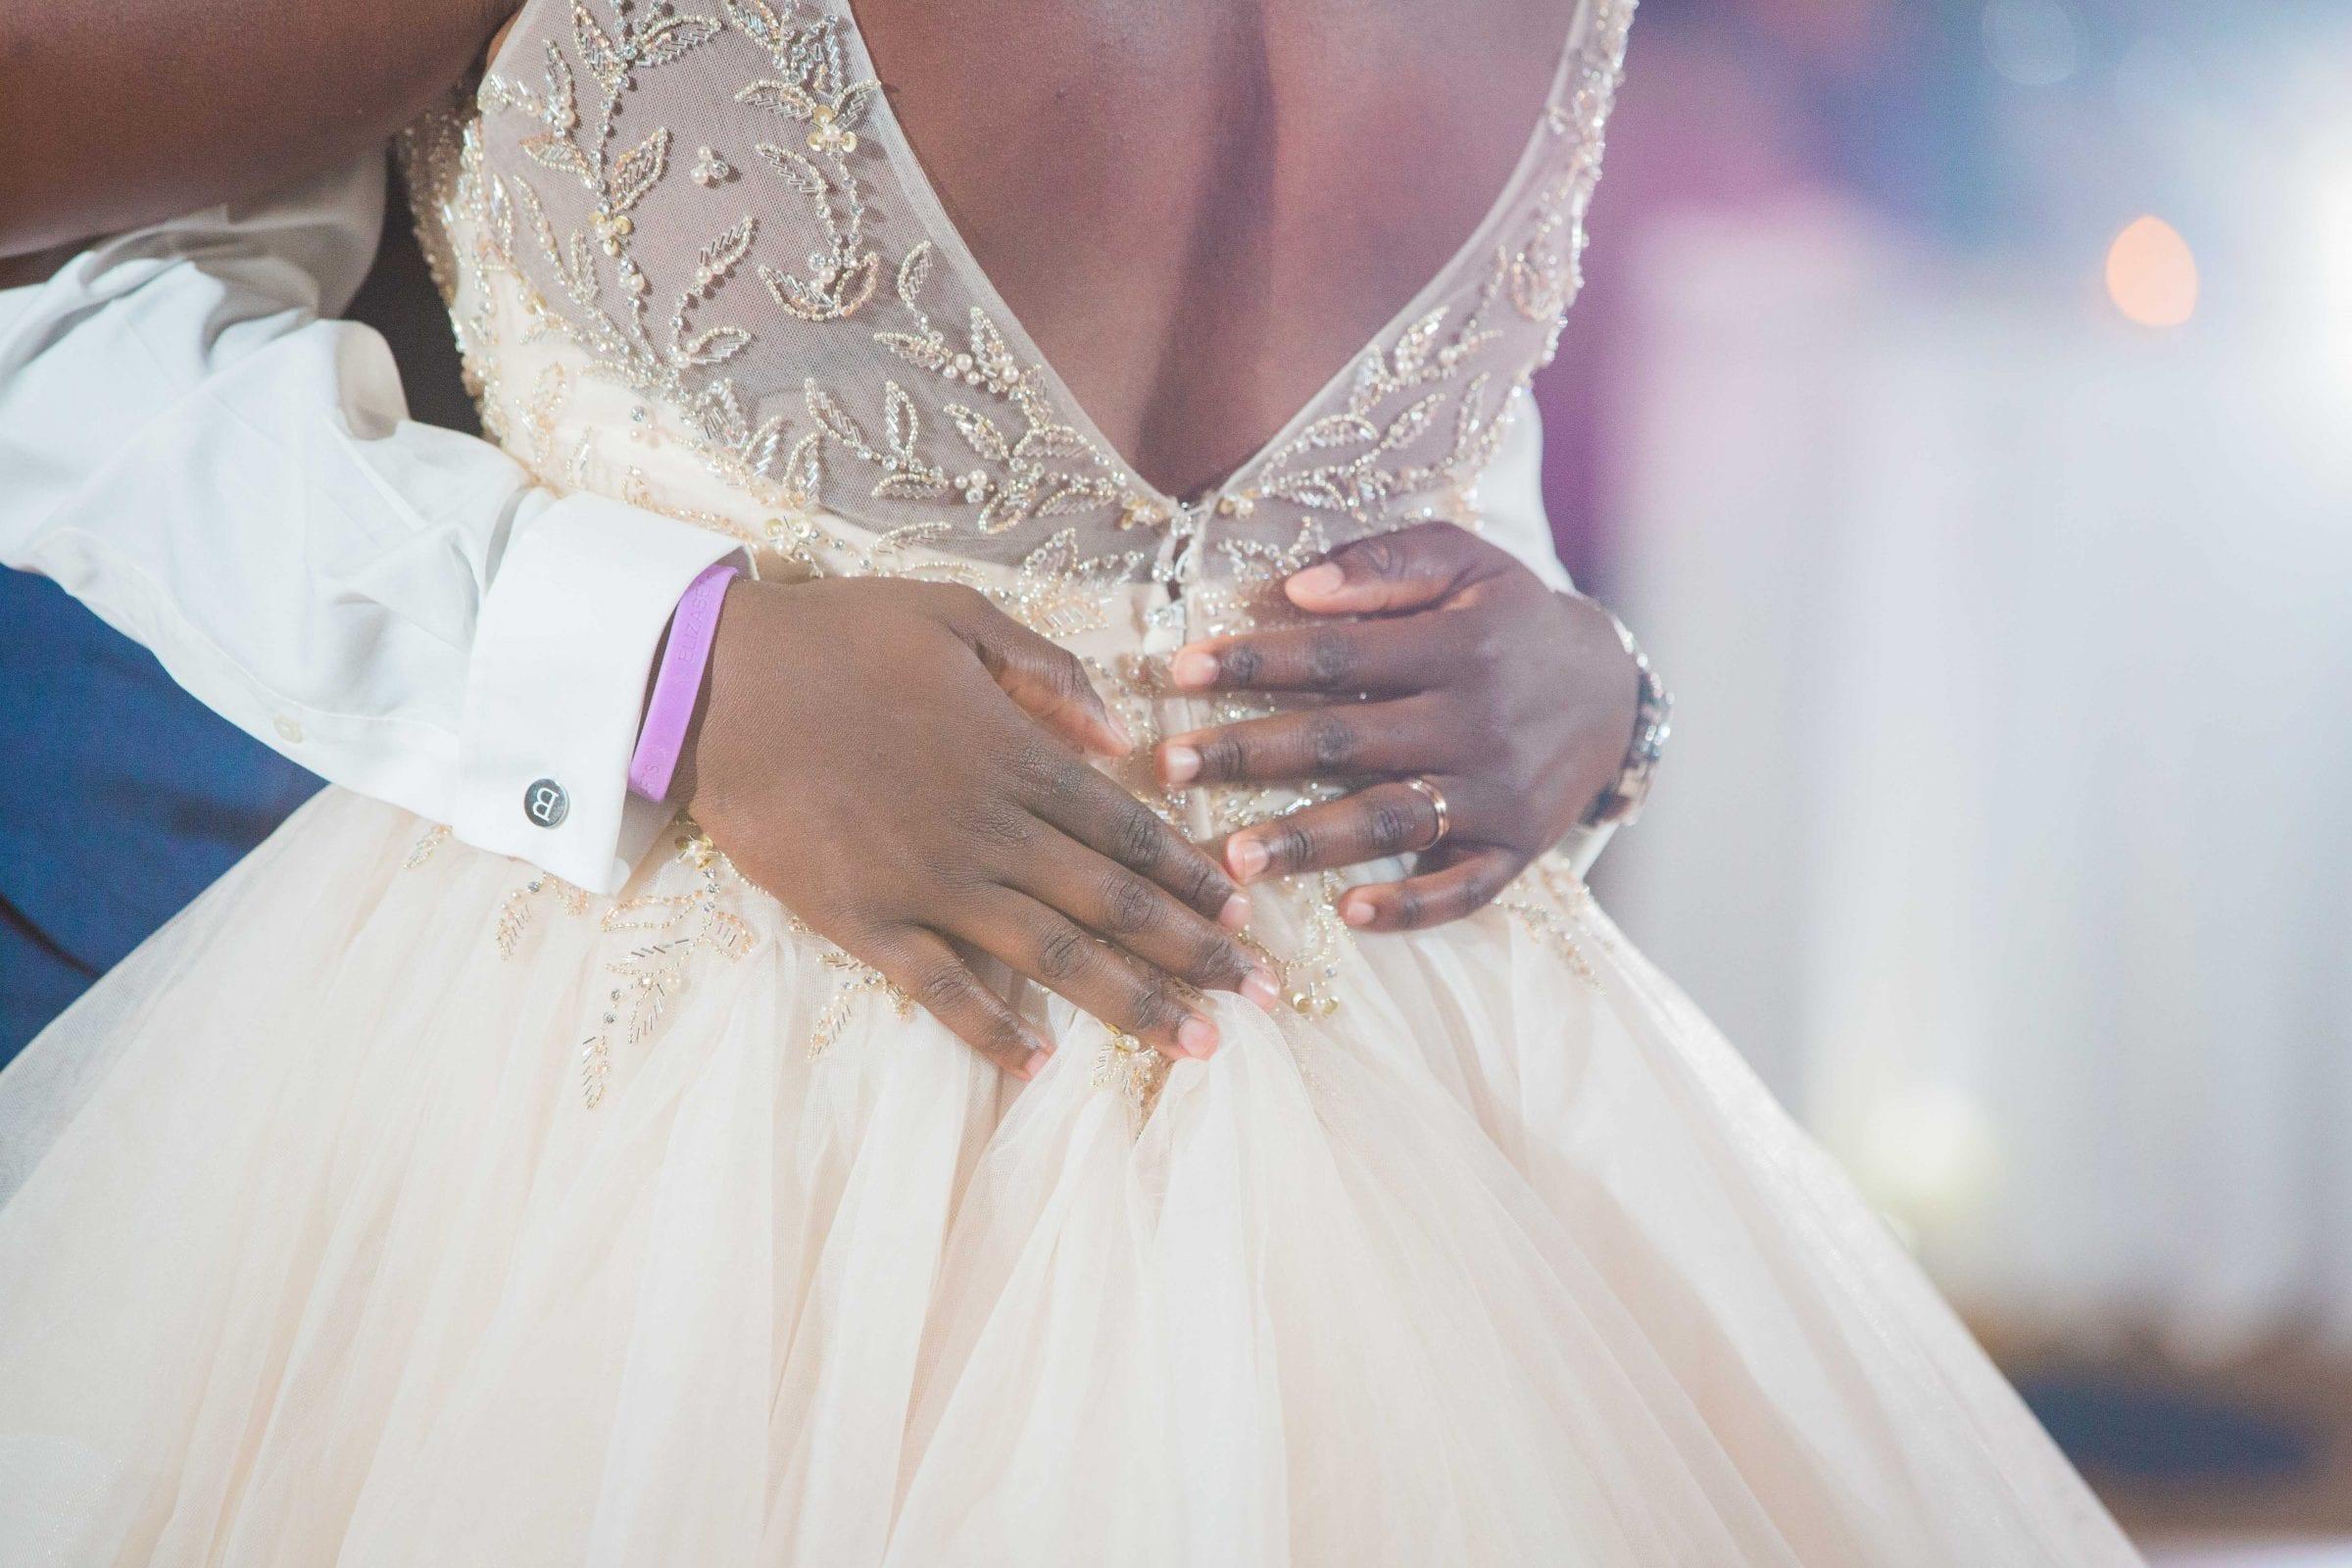 Onyema wedding La Cantera dancing her back